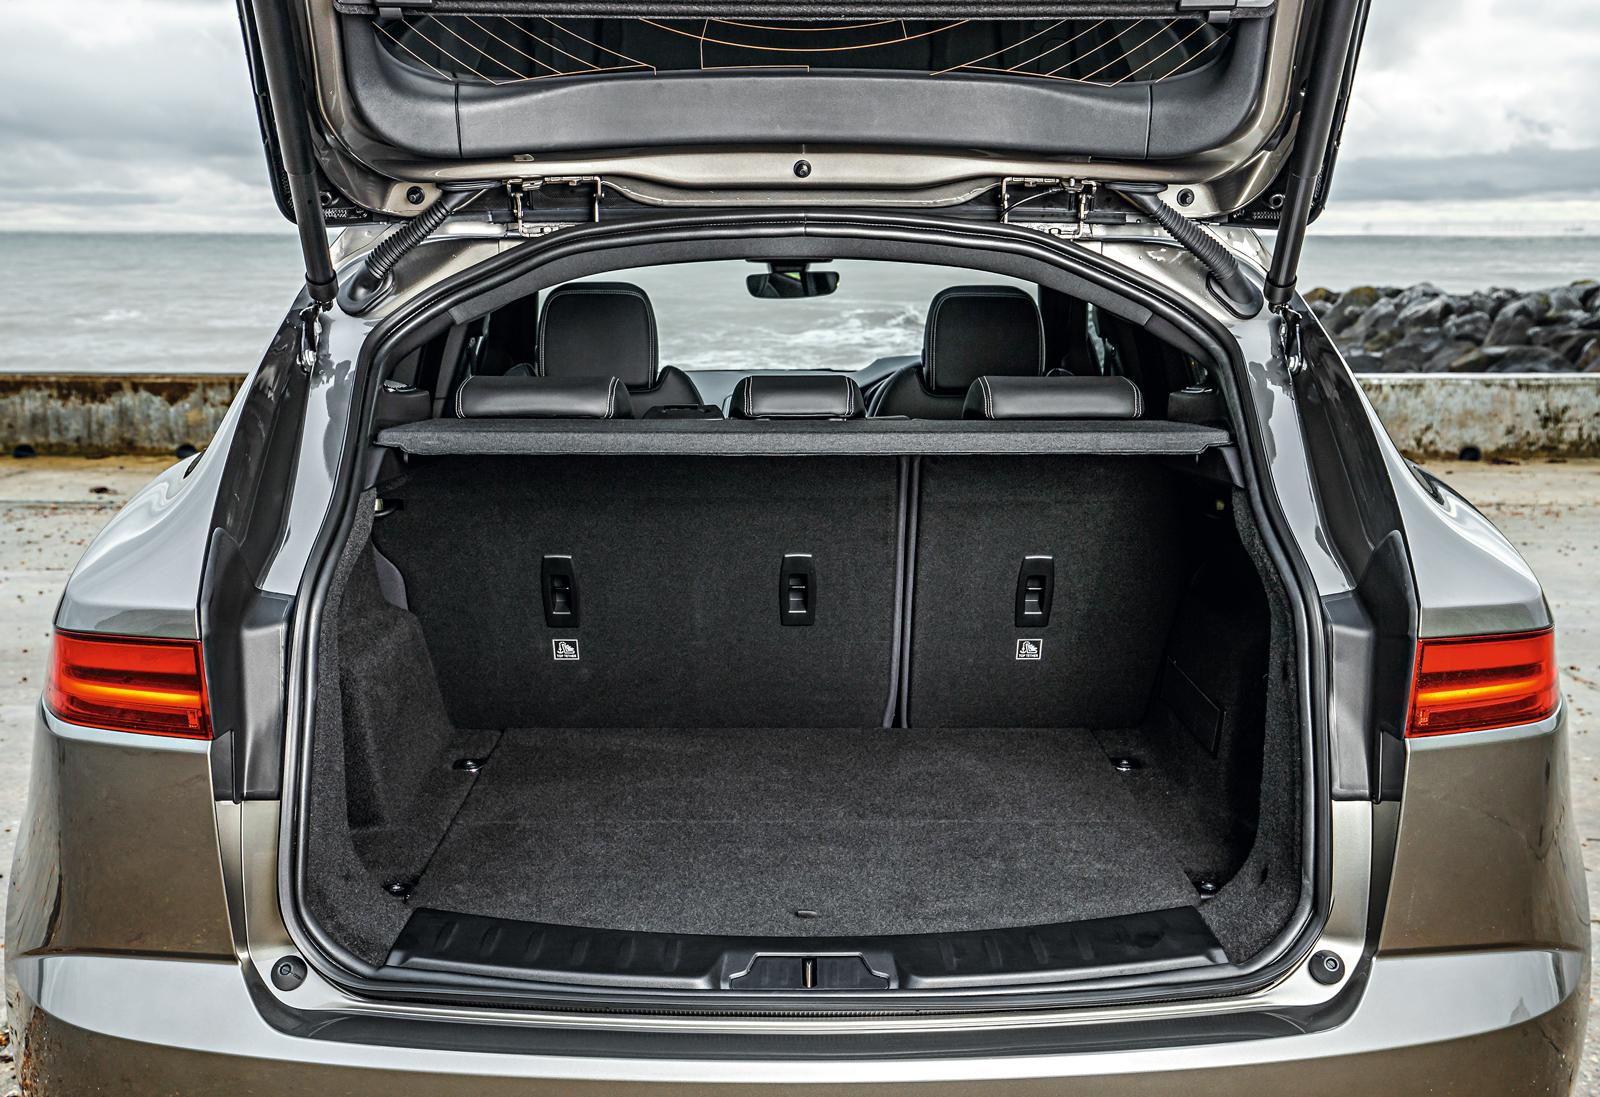 Porta-malas carrega 484 litros